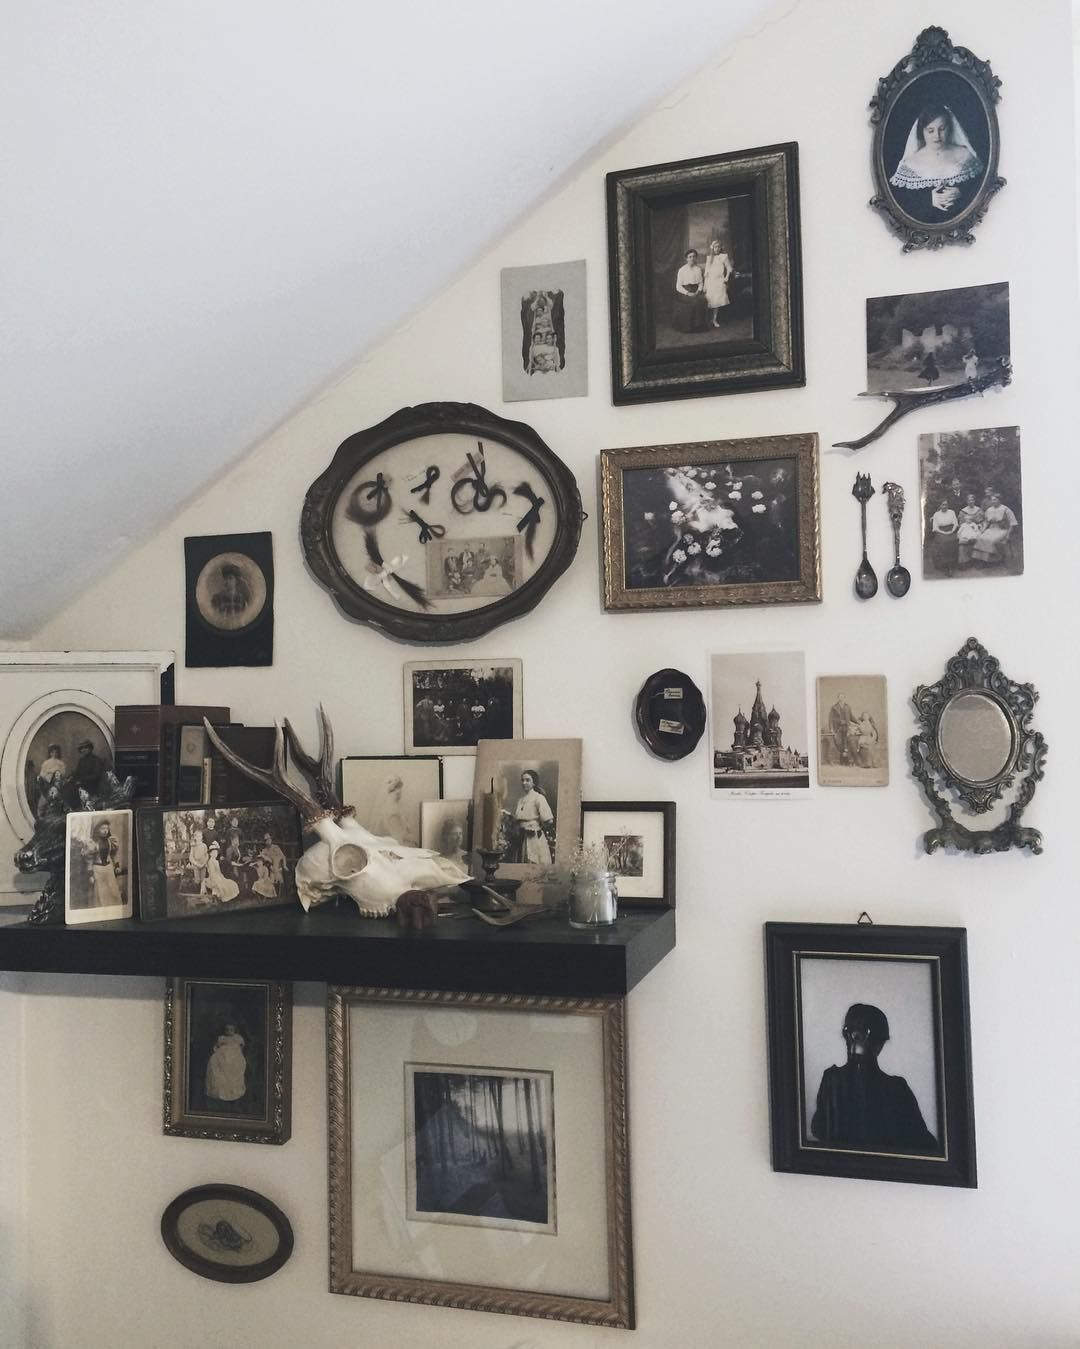 2,027 Me gusta, 25 comentarios - Olesya Parfenyuk (@schwarzkopfnonne) en Instagram: Reorganizing. Finally found a fitting frame for @nonalimmen's beautiful work and for my 'Zöpfe'… #dunkleinnenräume